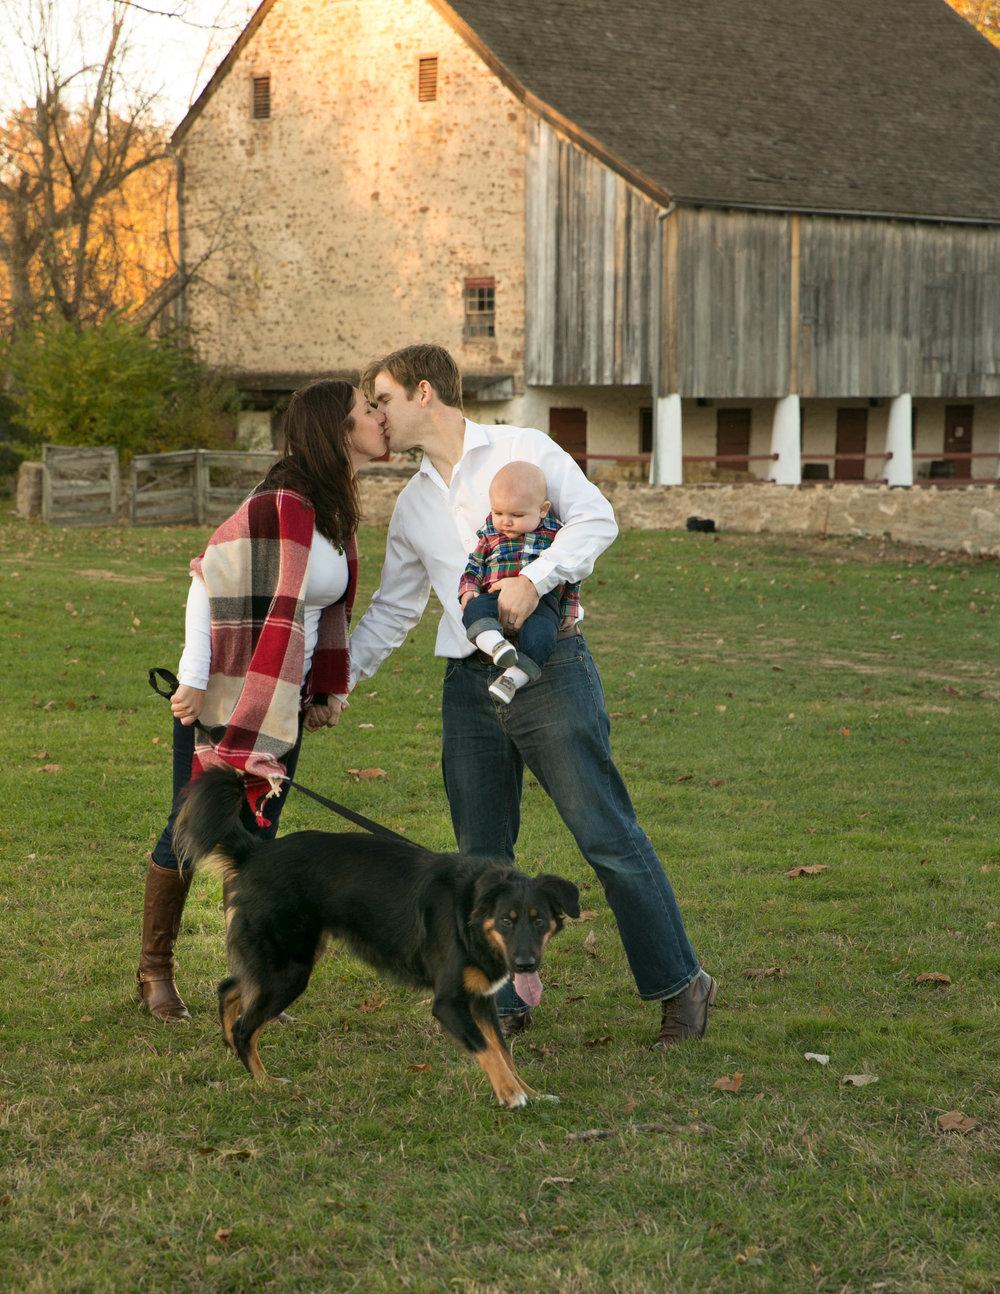 Graeme Park, Horsham, PA, Family Portrait with Dog20161106Baltimore, Maryland_Jewish Engagement Party_Tani and Jordy0215.jpg